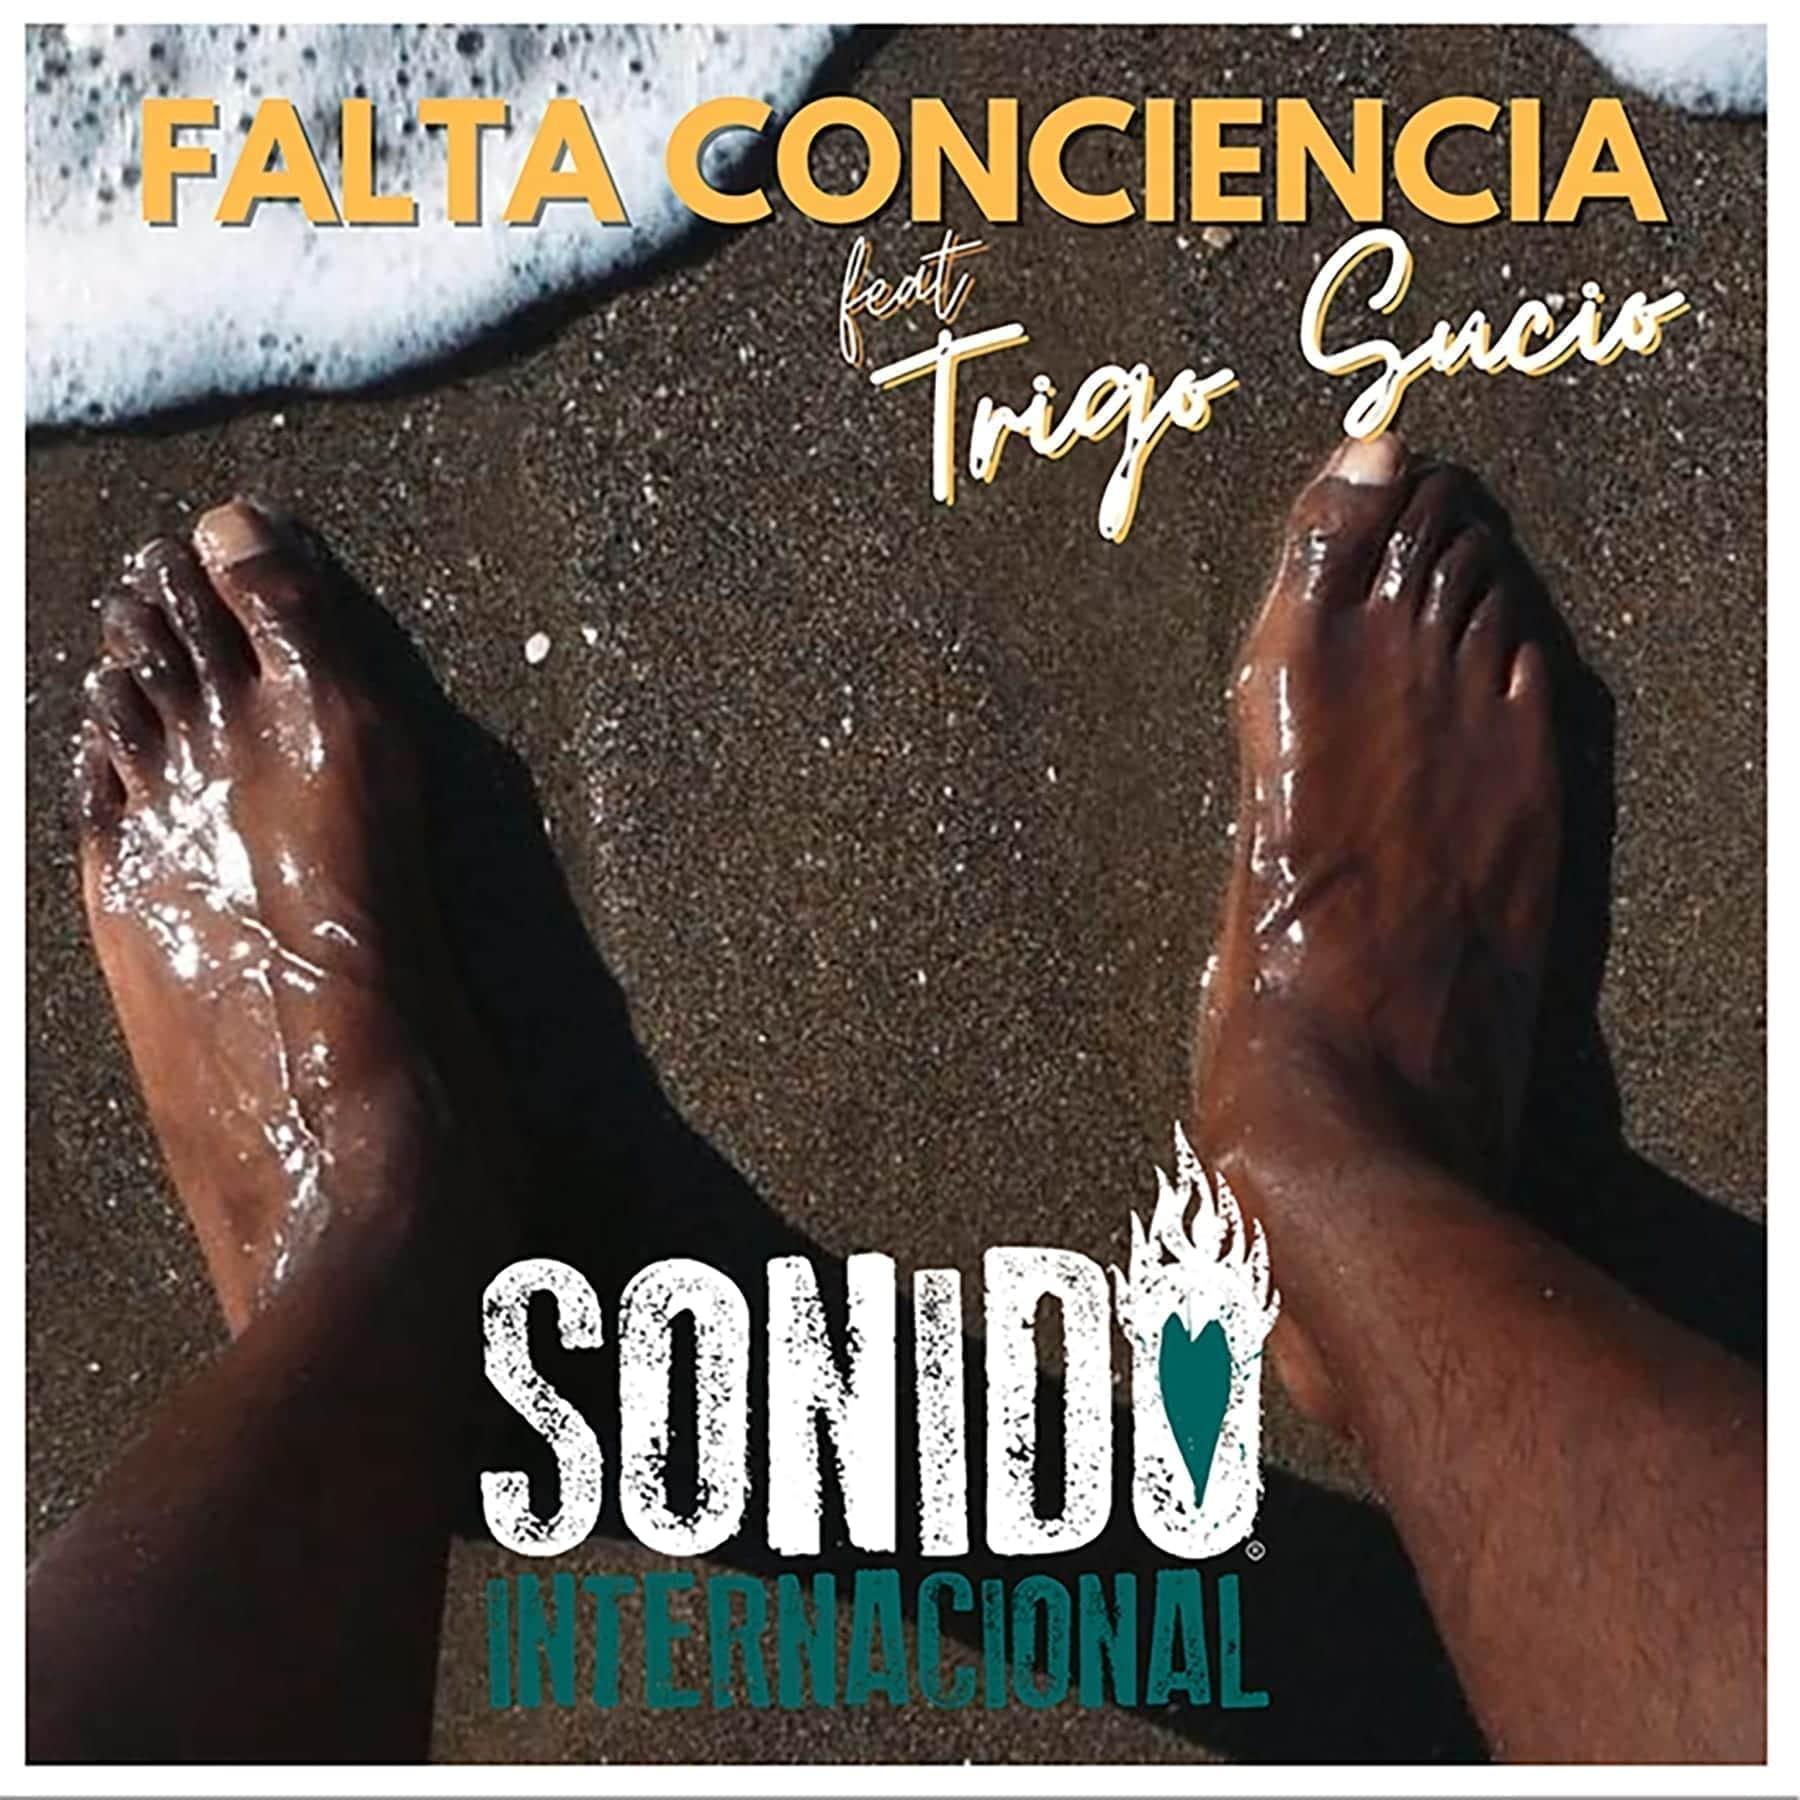 Manu Sonido (Sonido Internacional) & Trigo Sucio (Córdoba) presentan Falta Conciencia